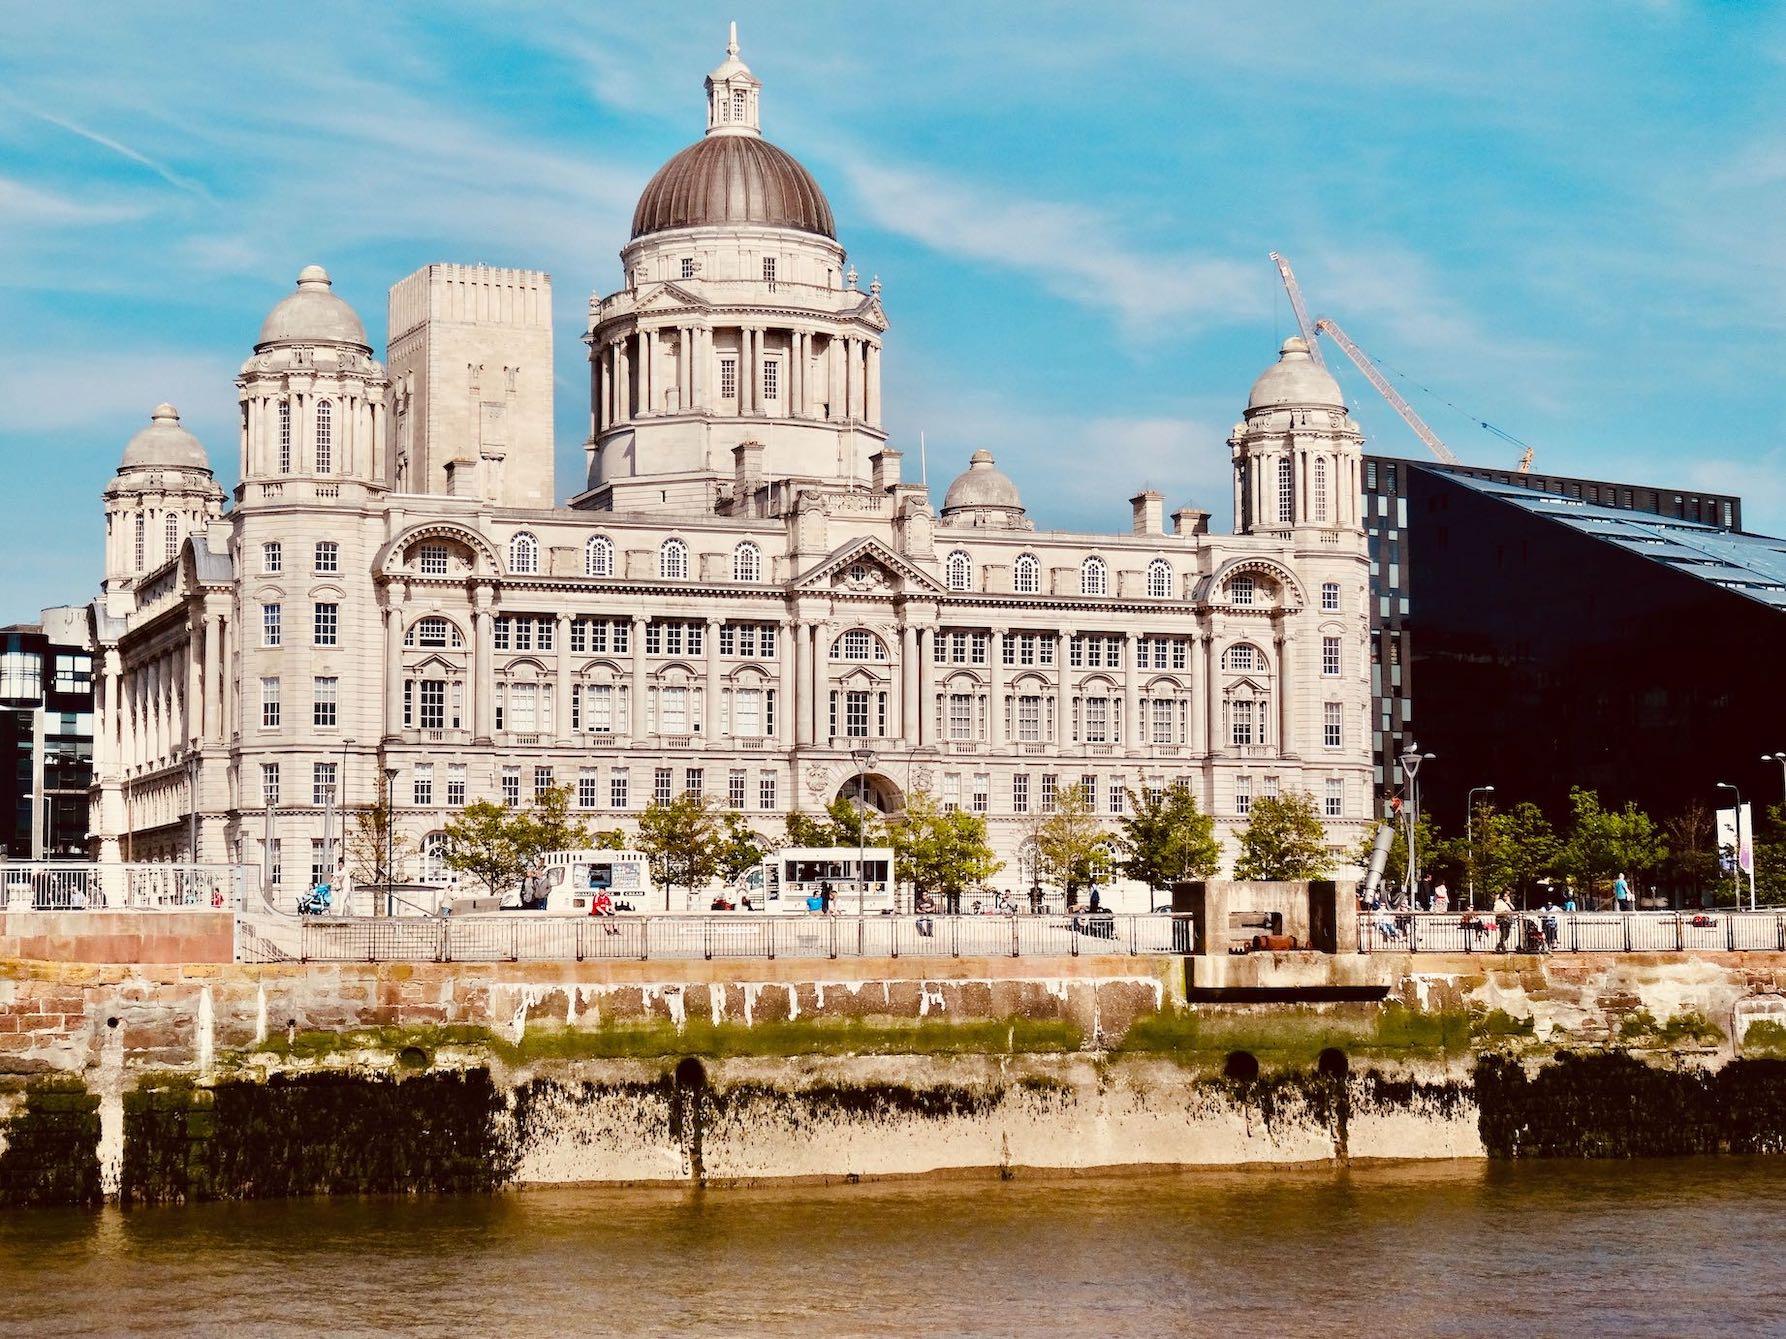 Port of Liverpool Building.